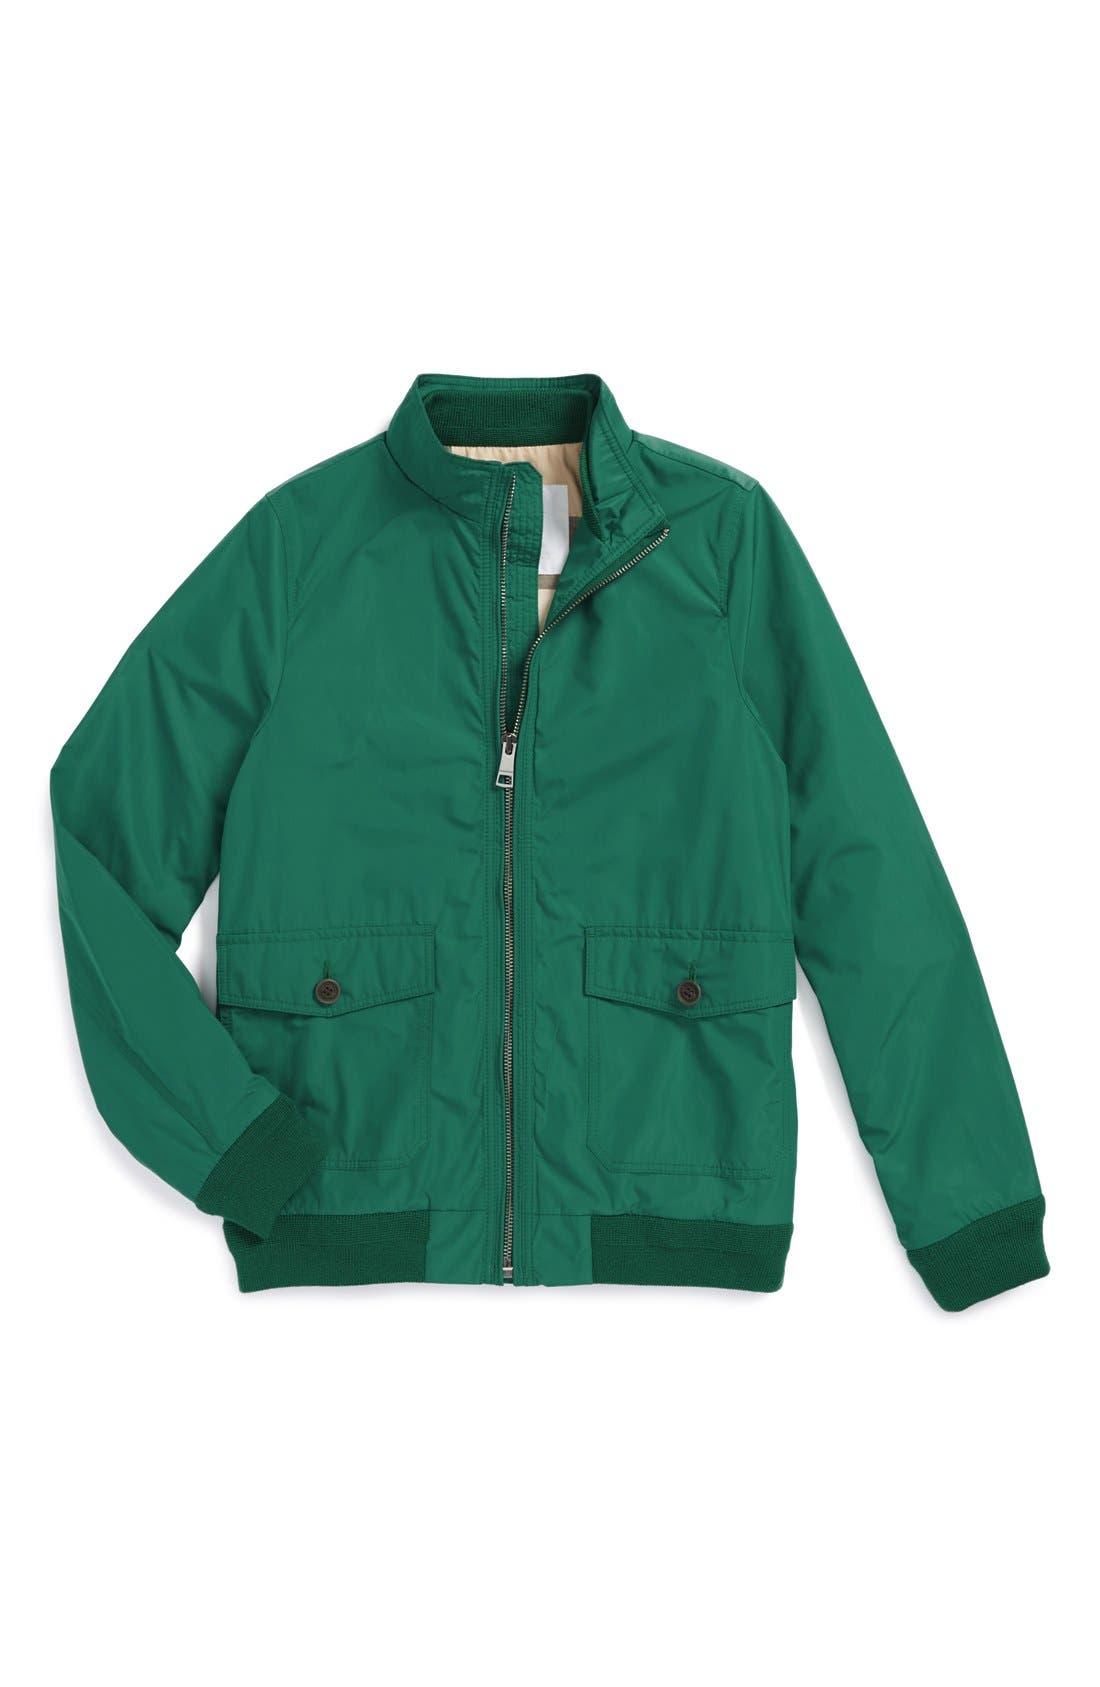 Main Image - Burberry Blouson Technical Water Resistant Jacket (Little Boys & Big Boys)